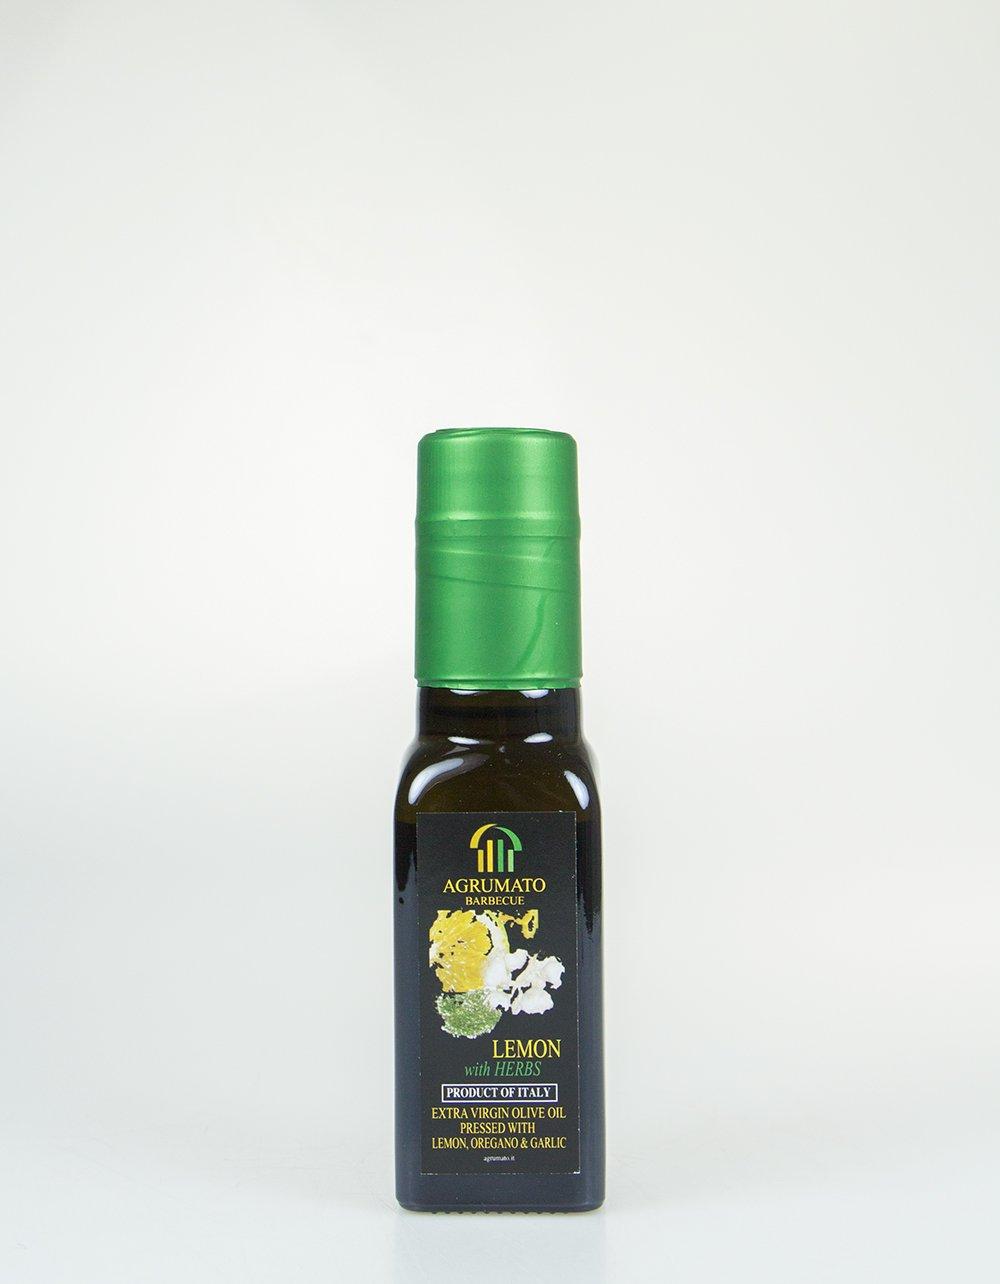 Agrumato Olive Oil with Lemon, Oregano and Garlic SALE 100mL